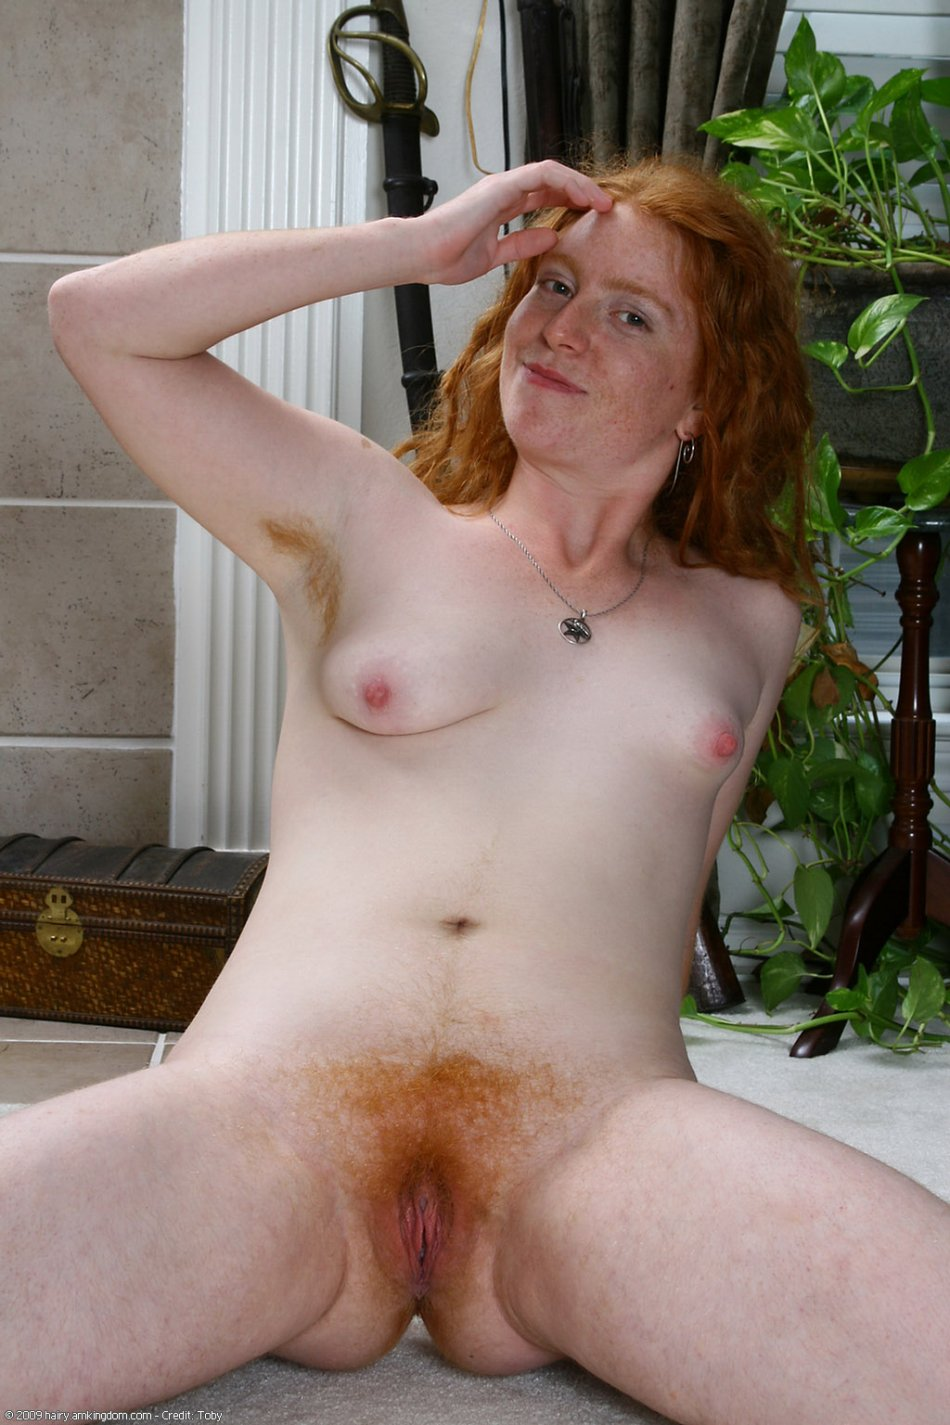 Hairy redhead milf porn pics